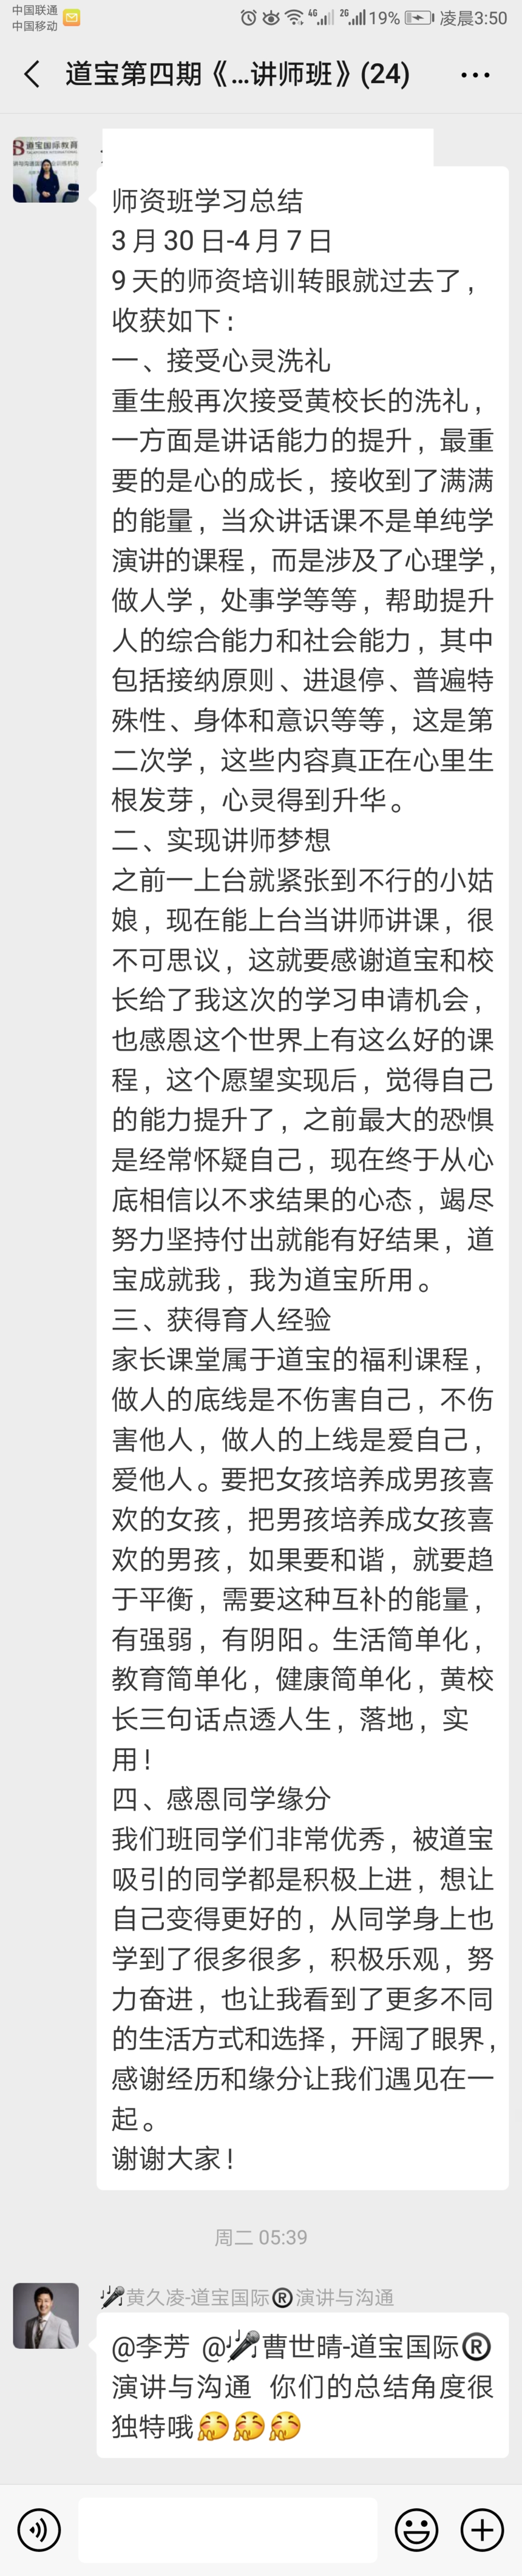 Screenshot_2019-04-11-03-50-44.png